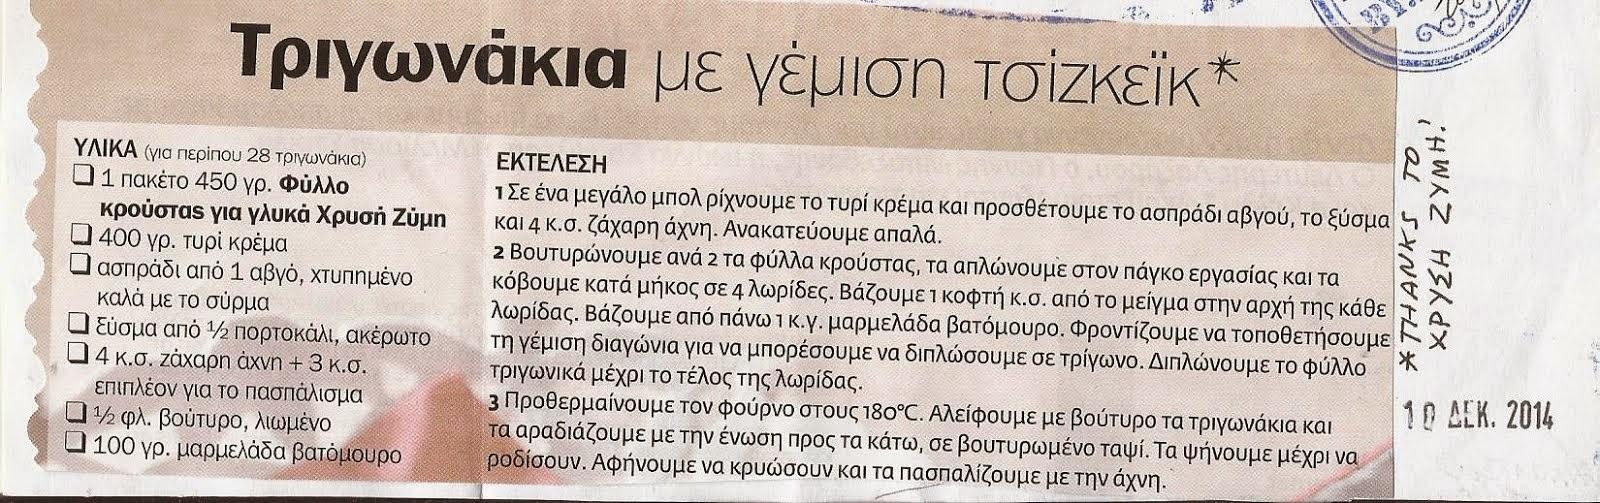 Katerina Nikoltsou - Grecia